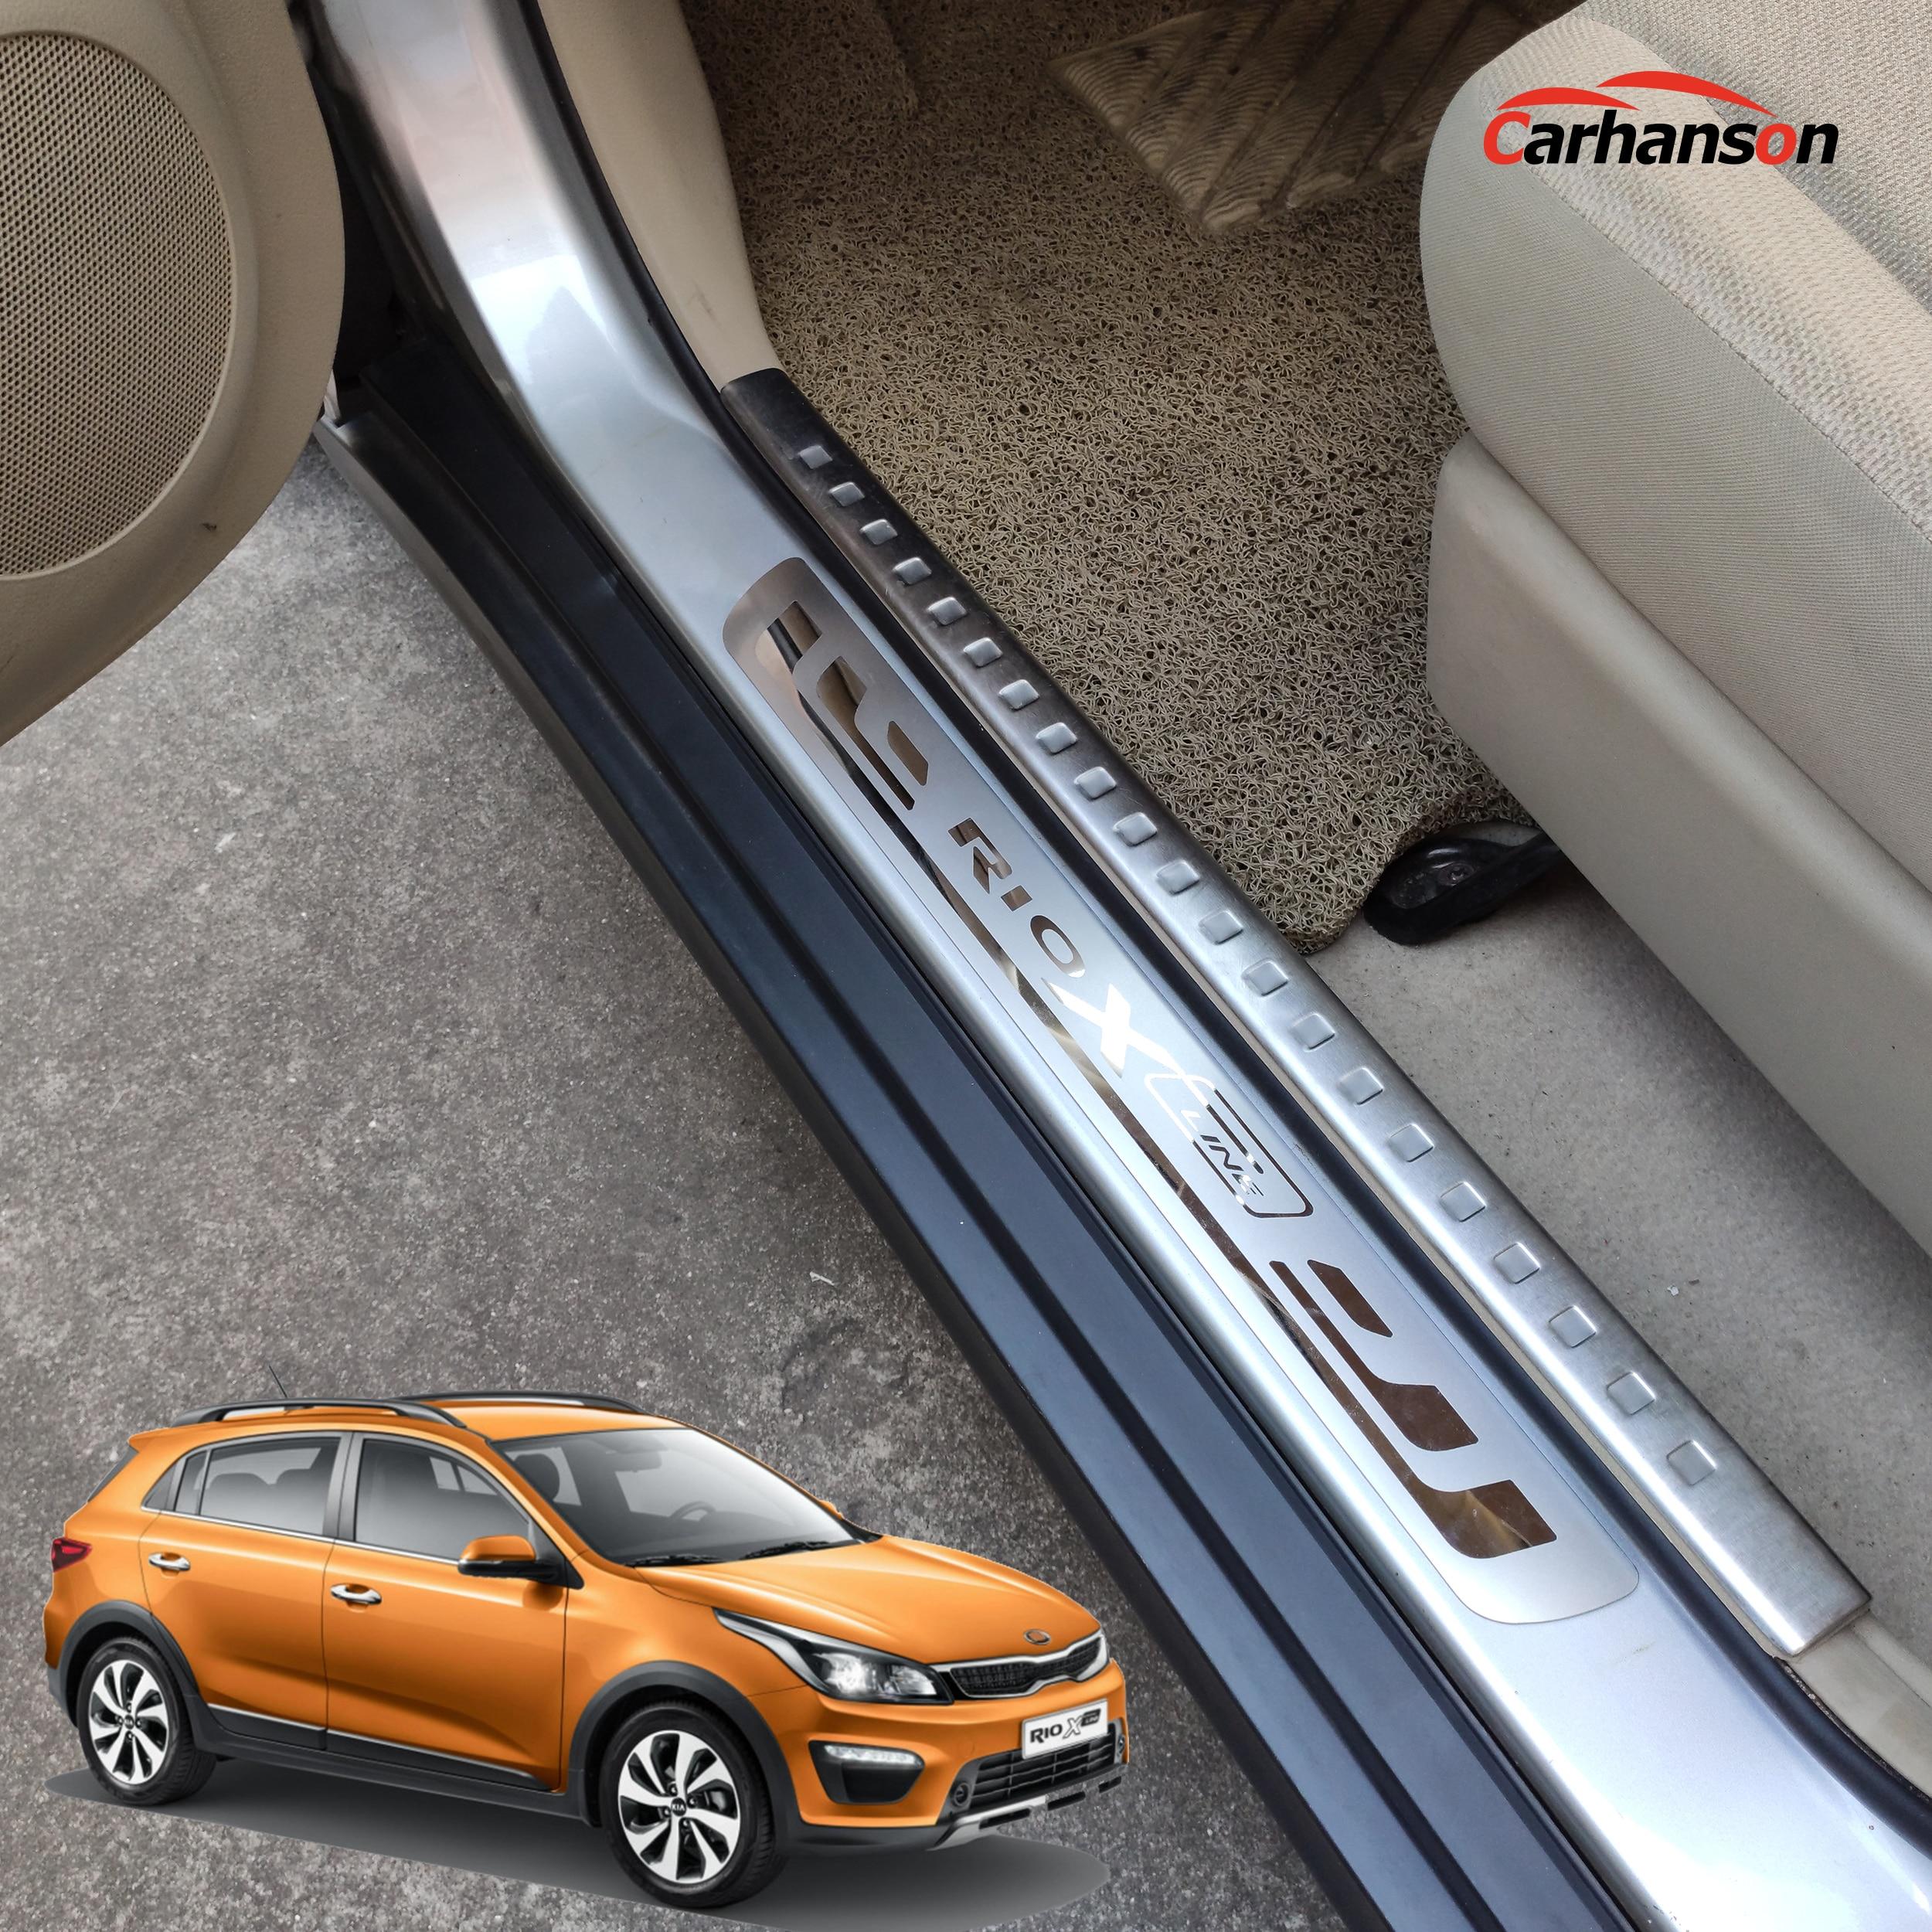 Estilo de coche para KIA RIO 3x4 x-Accesorios de línea de acero inoxidable embellecedor de alféizar de puerta desgaste protectores pedal Línea x 2015, 2017, 2018, 2019